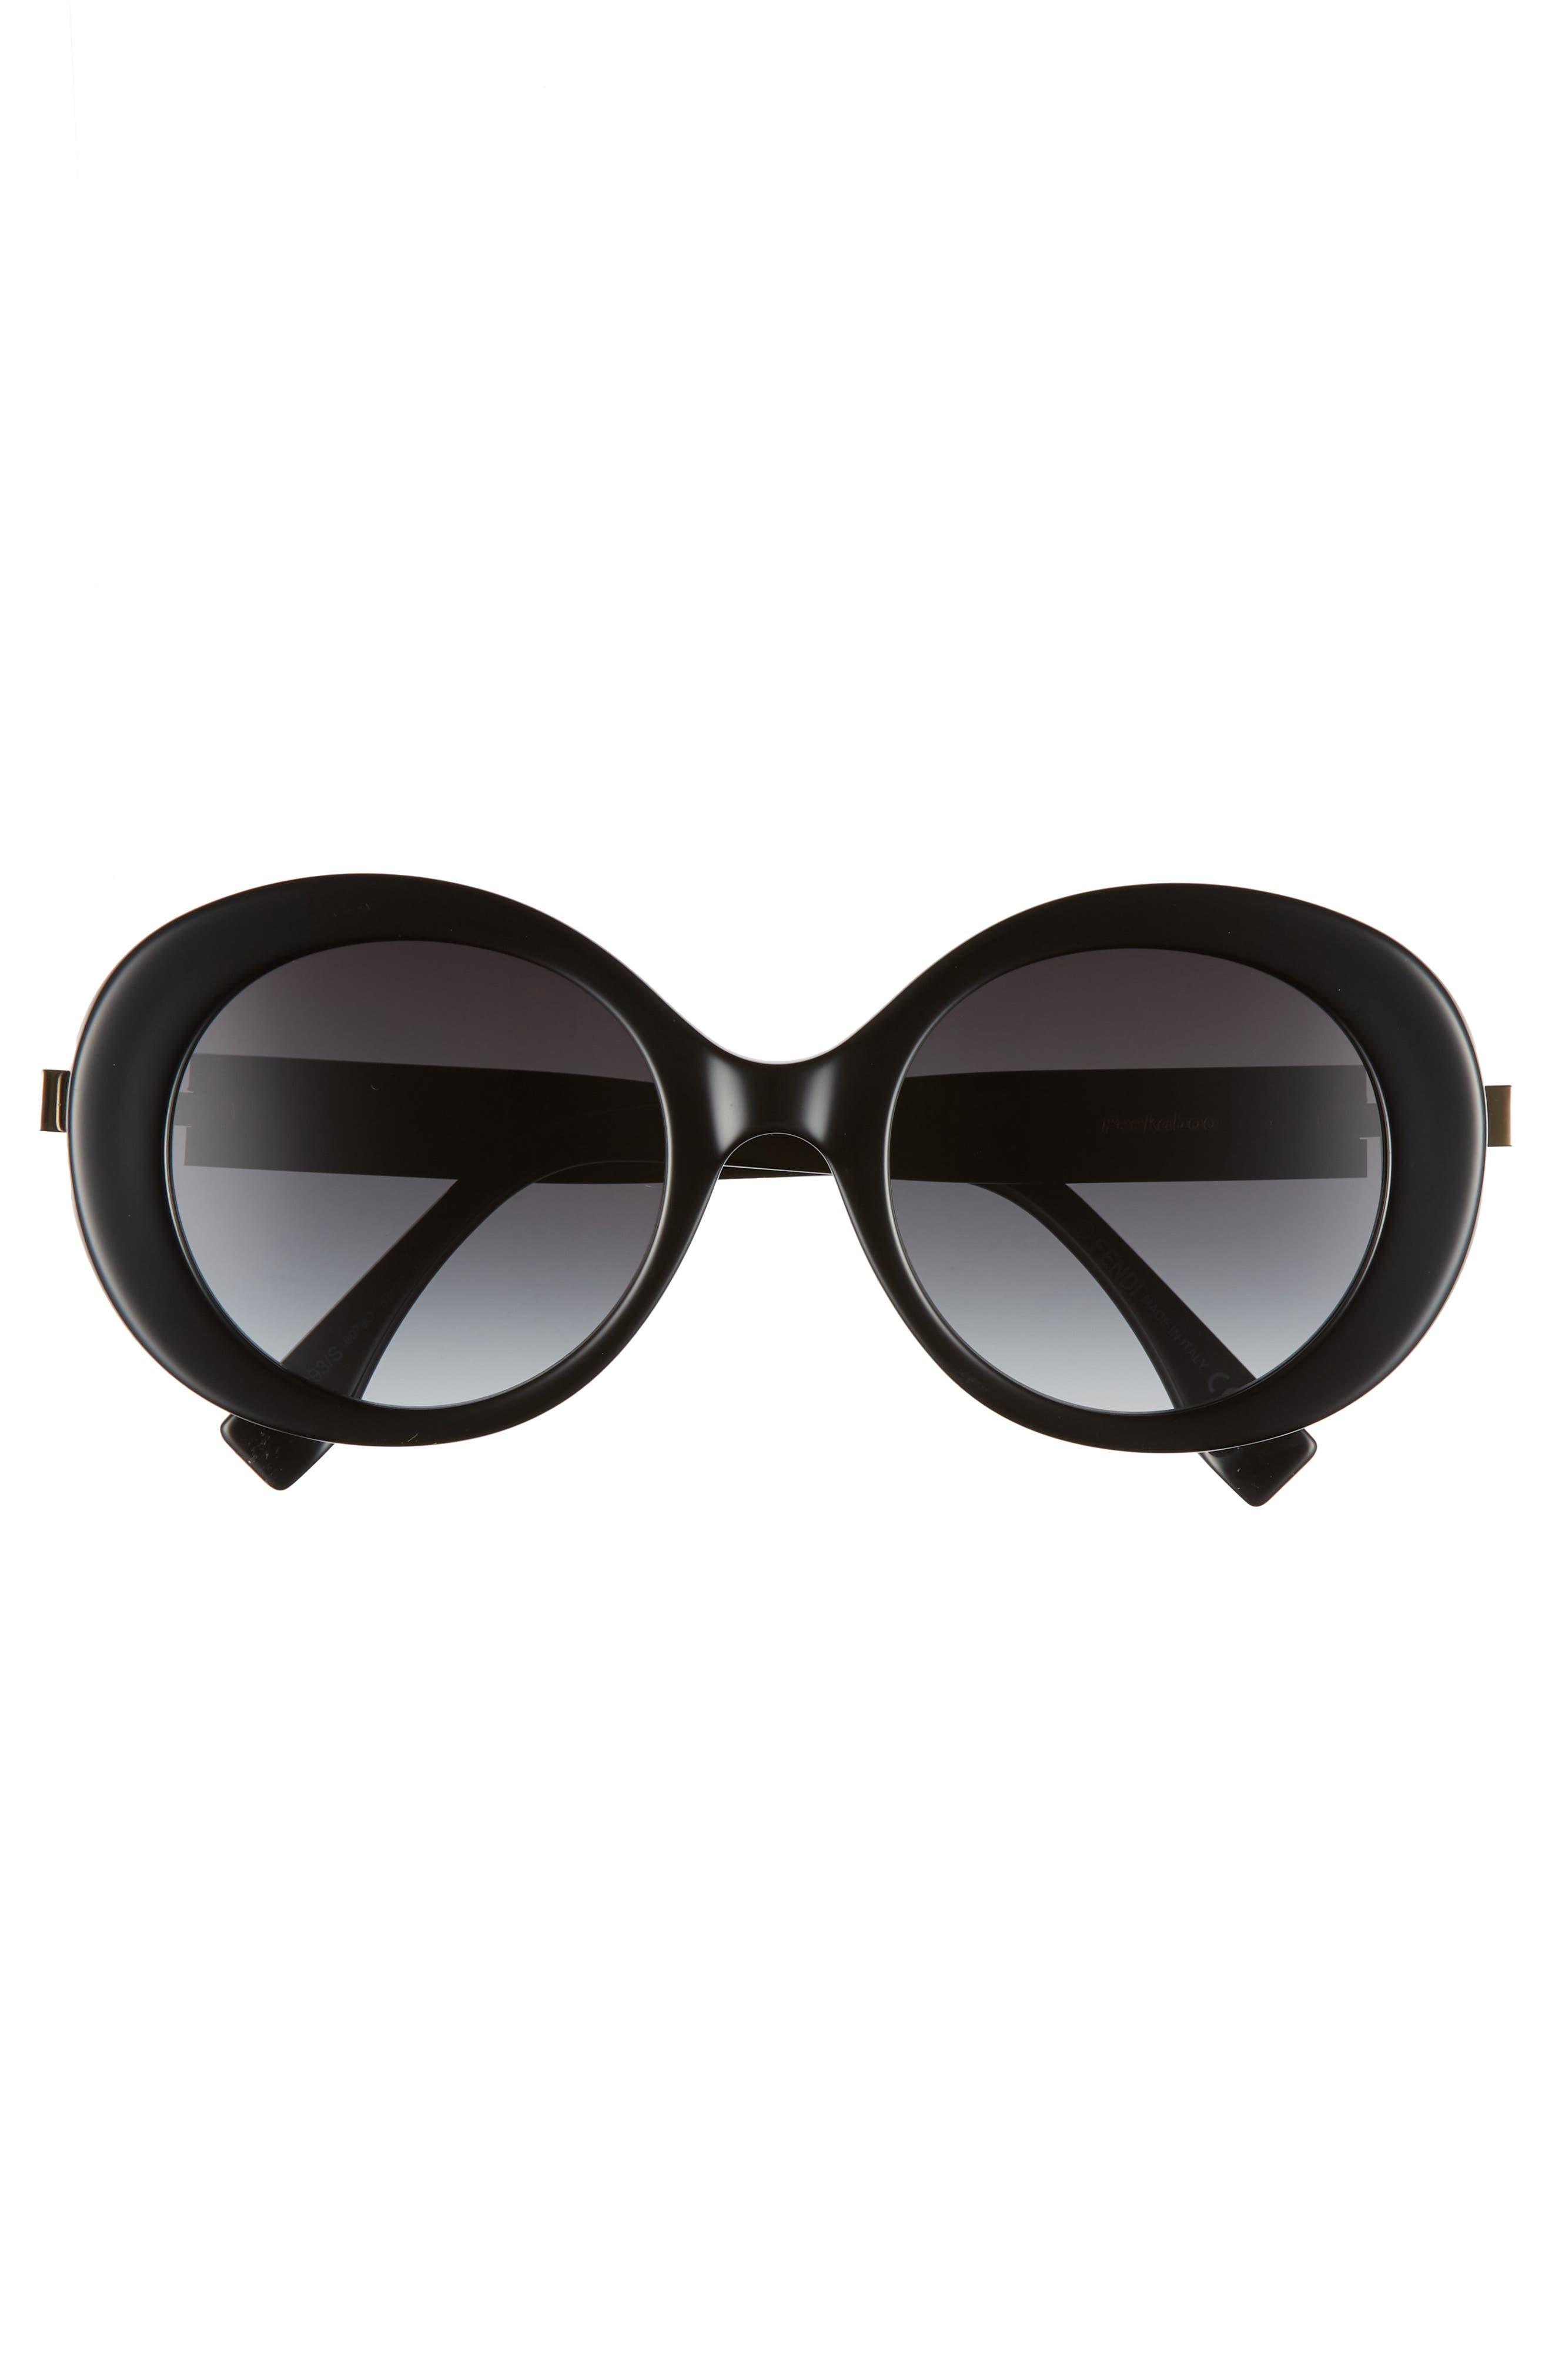 52mm Round Sunglasses,                             Alternate thumbnail 3, color,                             Black